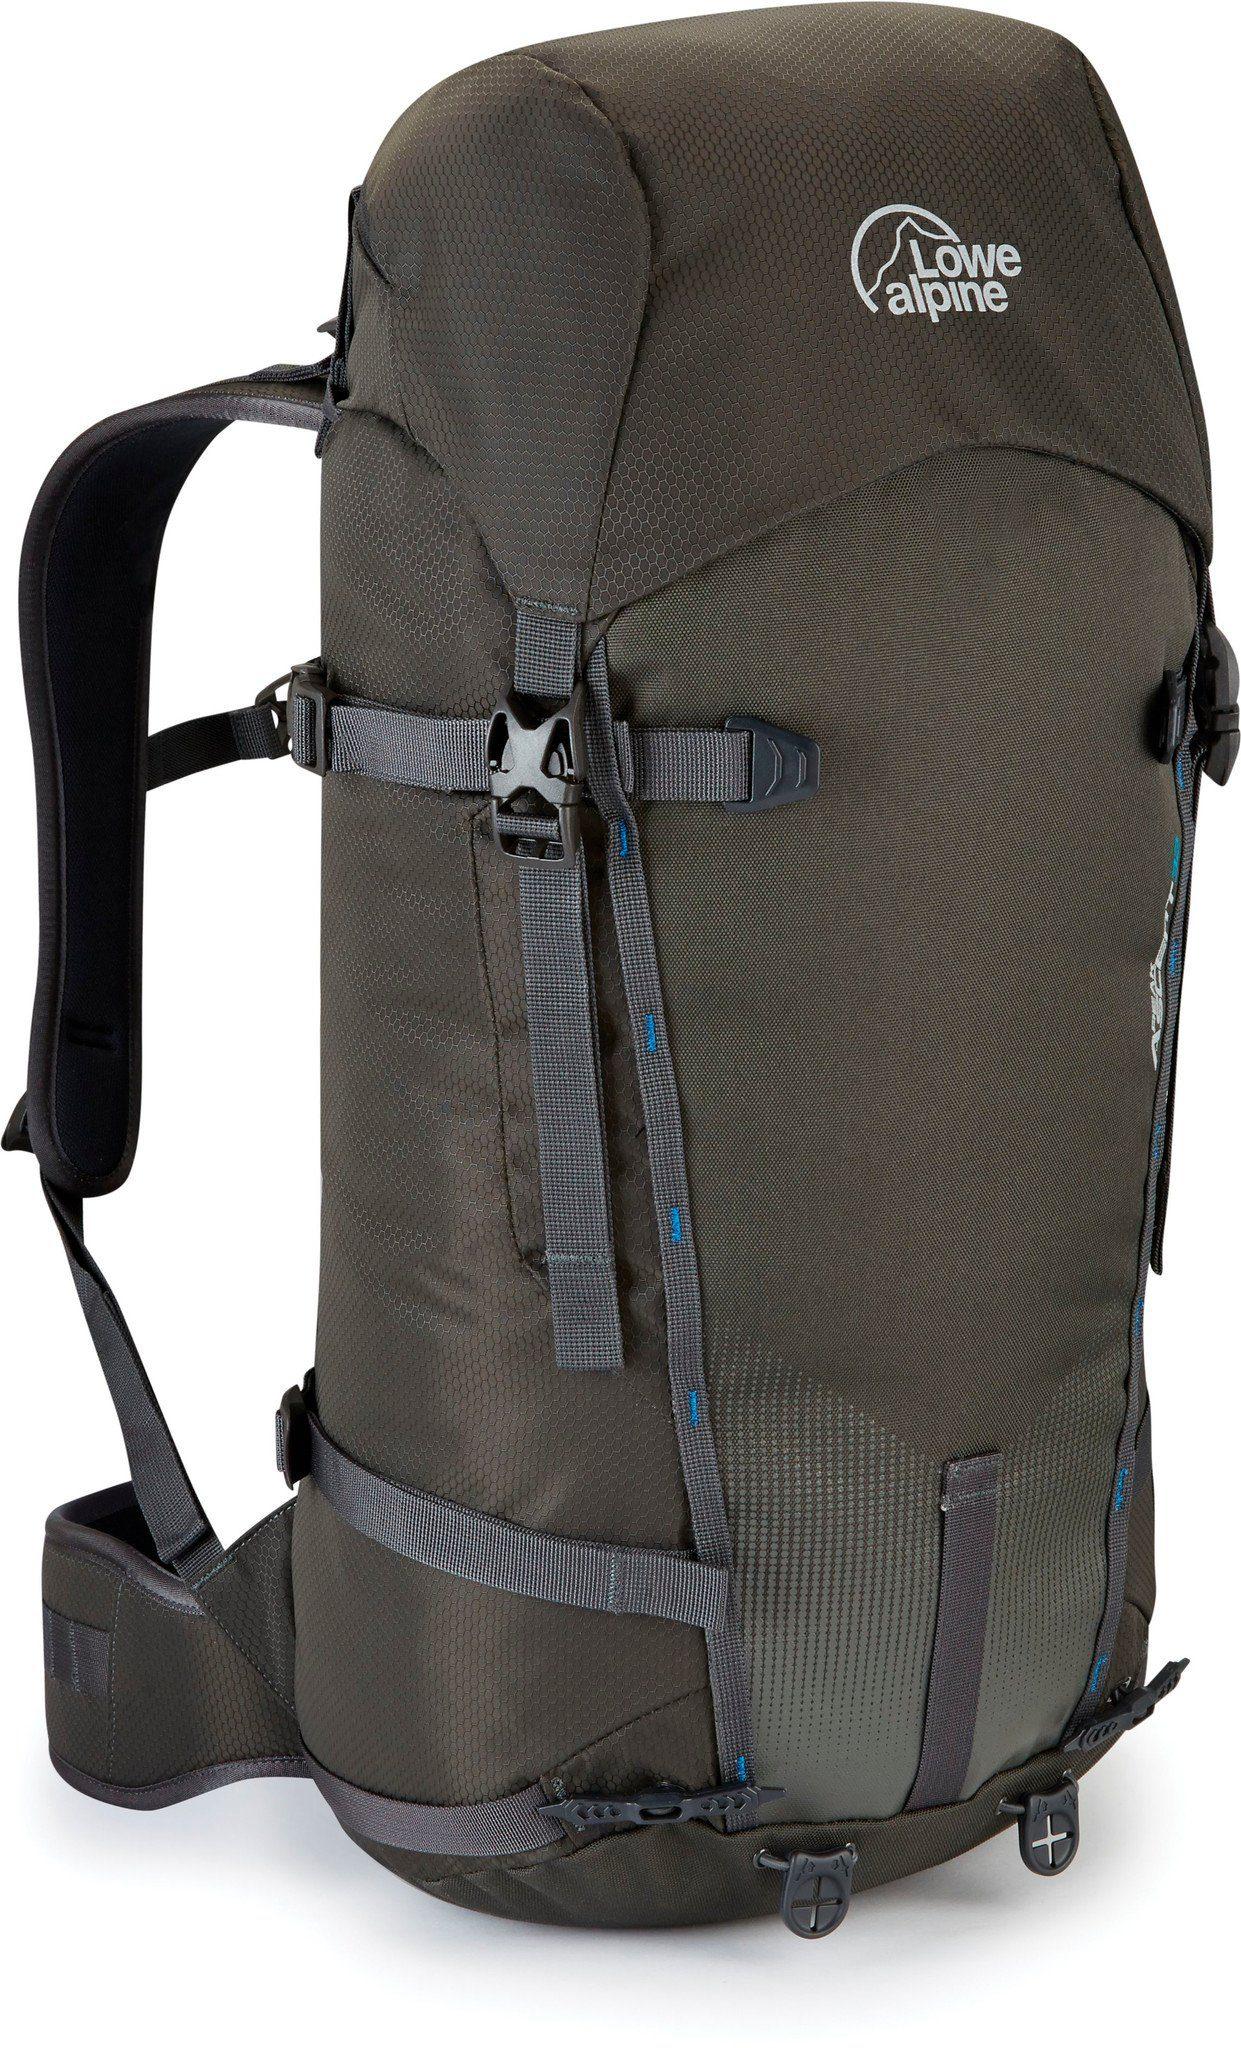 »peak Kaufen 32 Men« Backpack Ascent Online Alpine Lowe Wanderrucksack pLGjUMqSzV